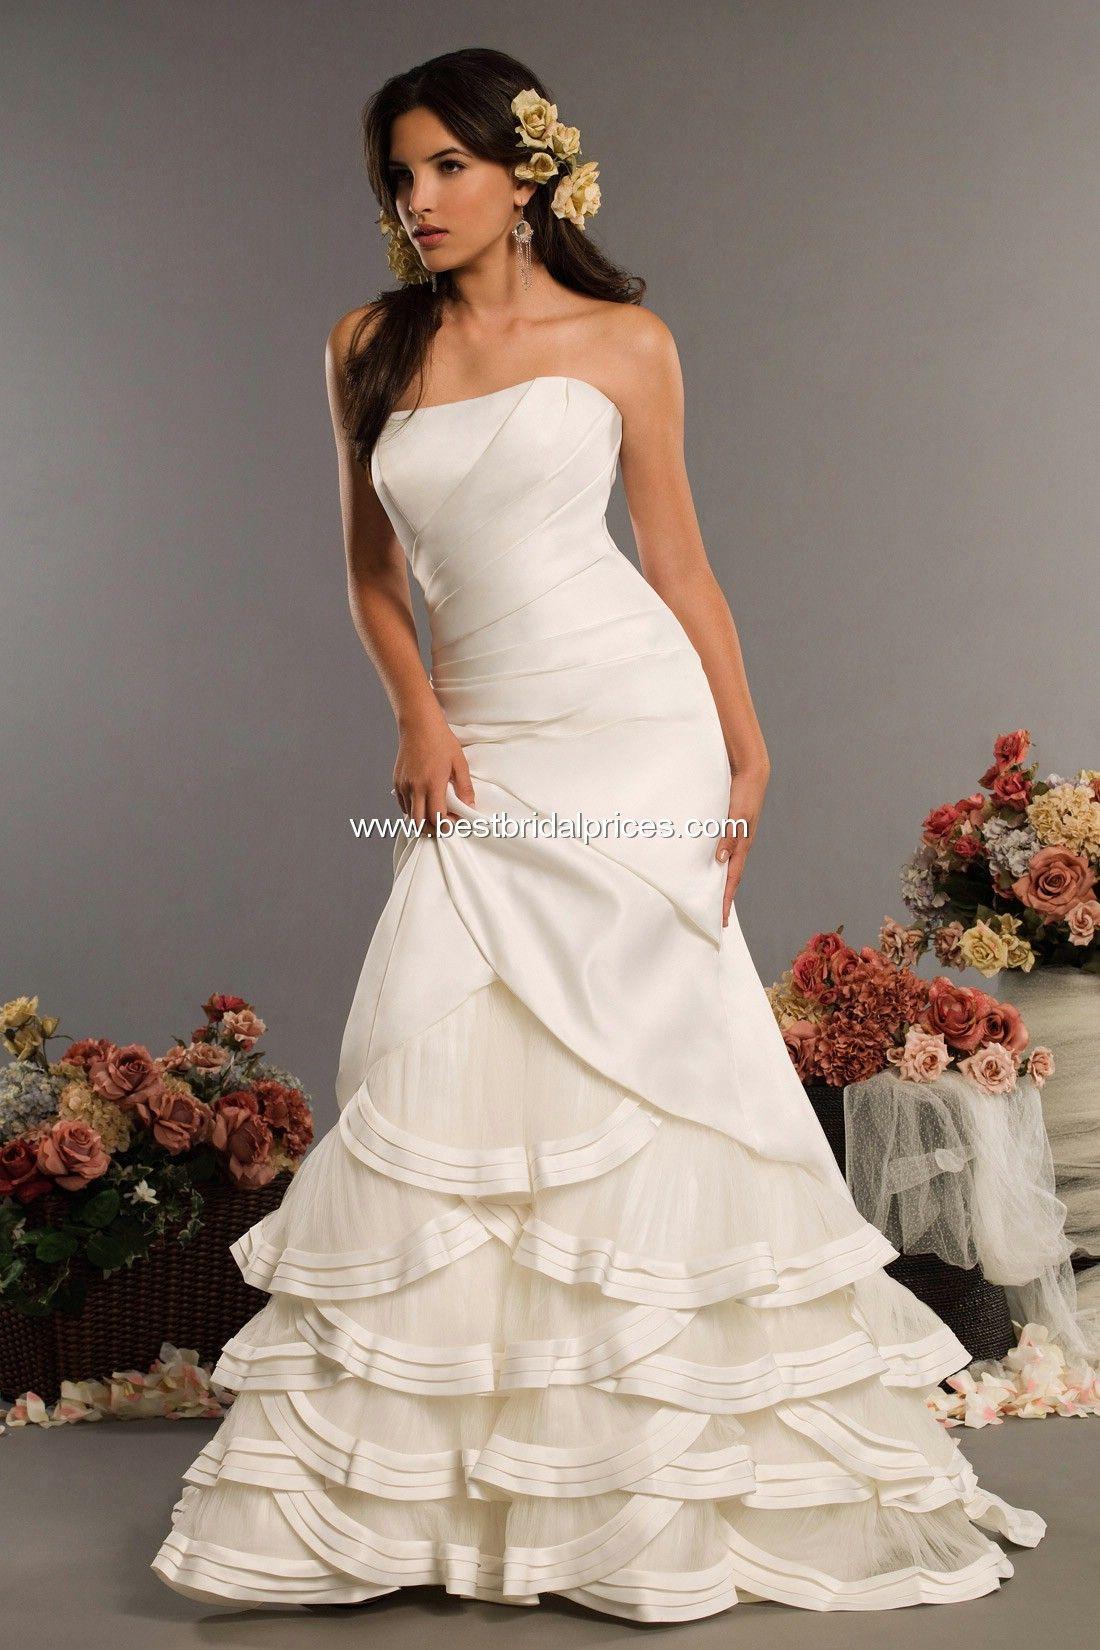 mexican wedding dress Mexican wedding dresses